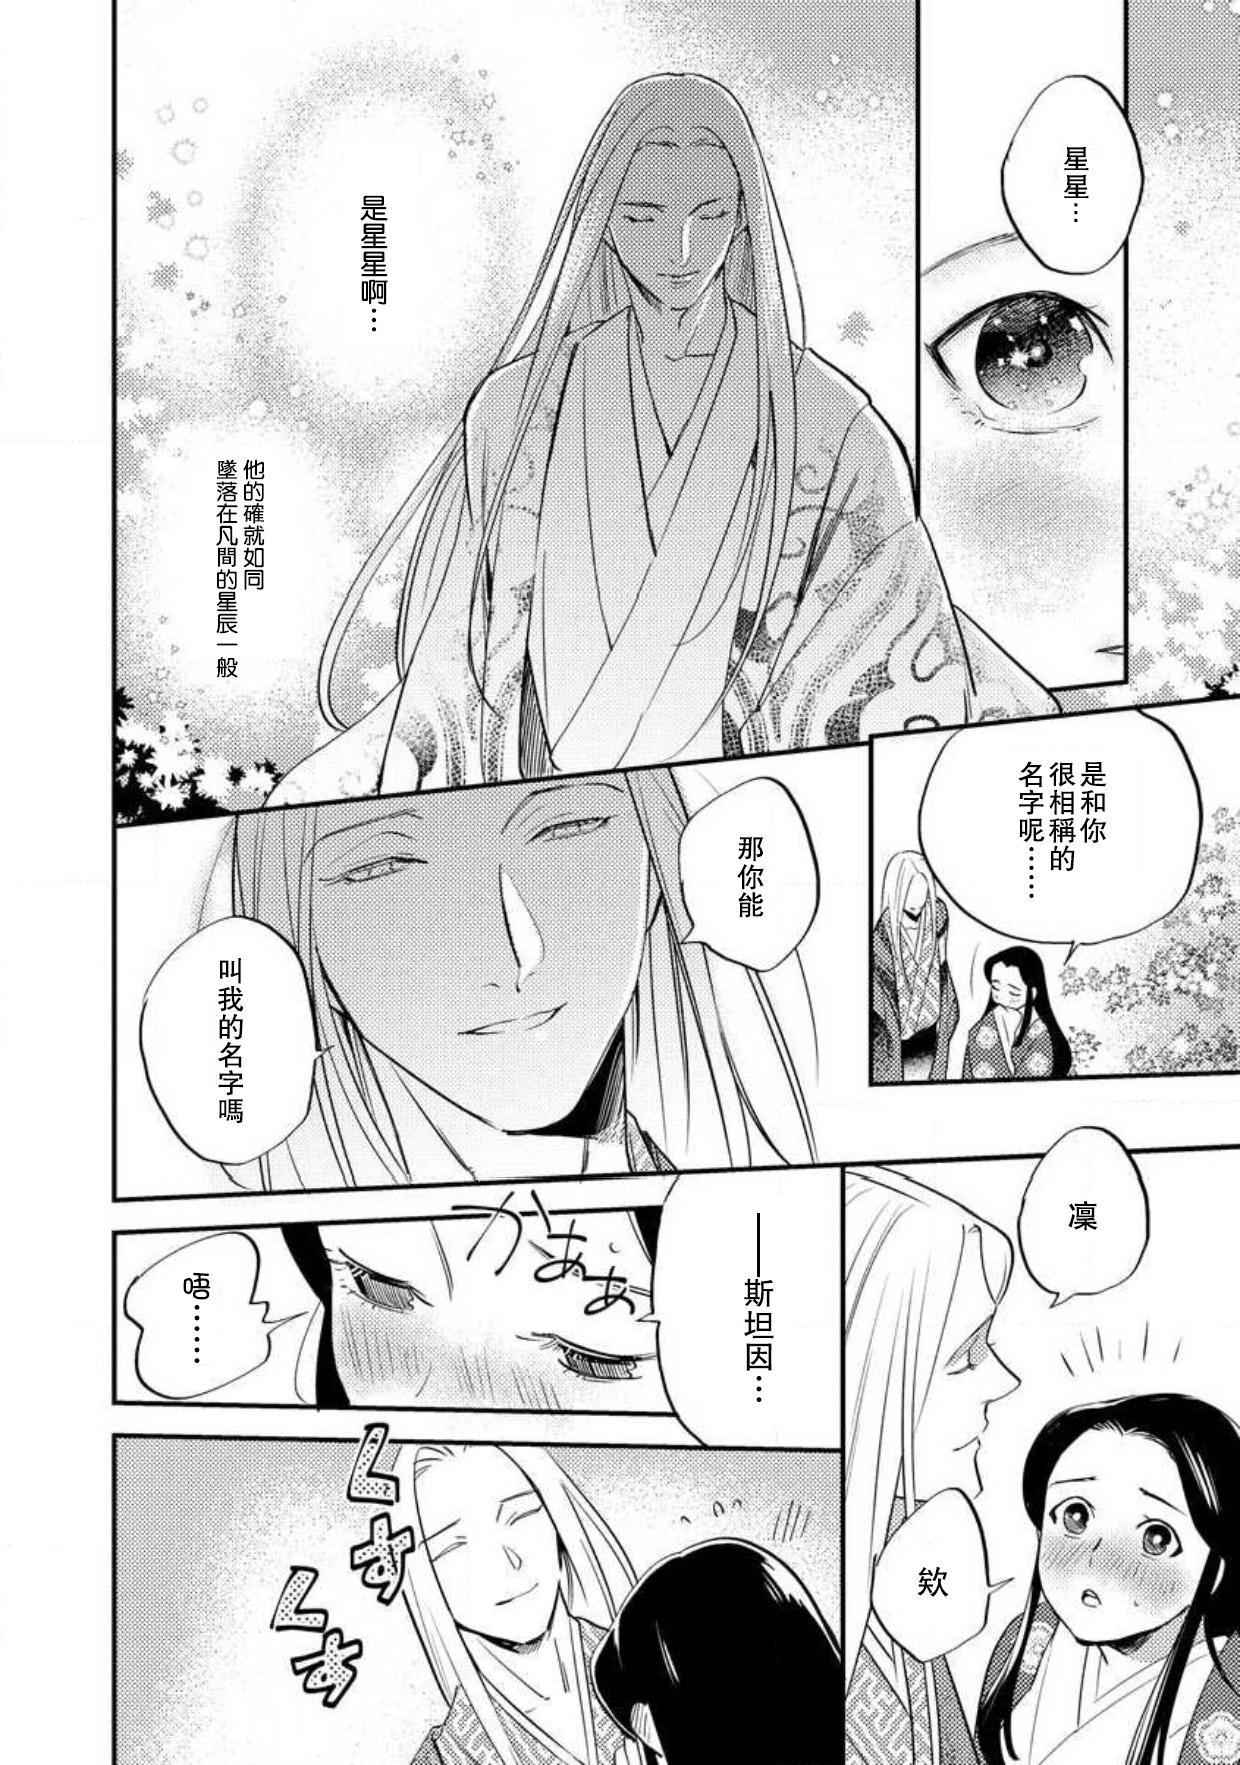 Oeyama suimutan utsukushiki oni no toraware hime | 大江山醉夢逸話 美麗的鬼與被囚禁的公主 Ch. 1-8 191